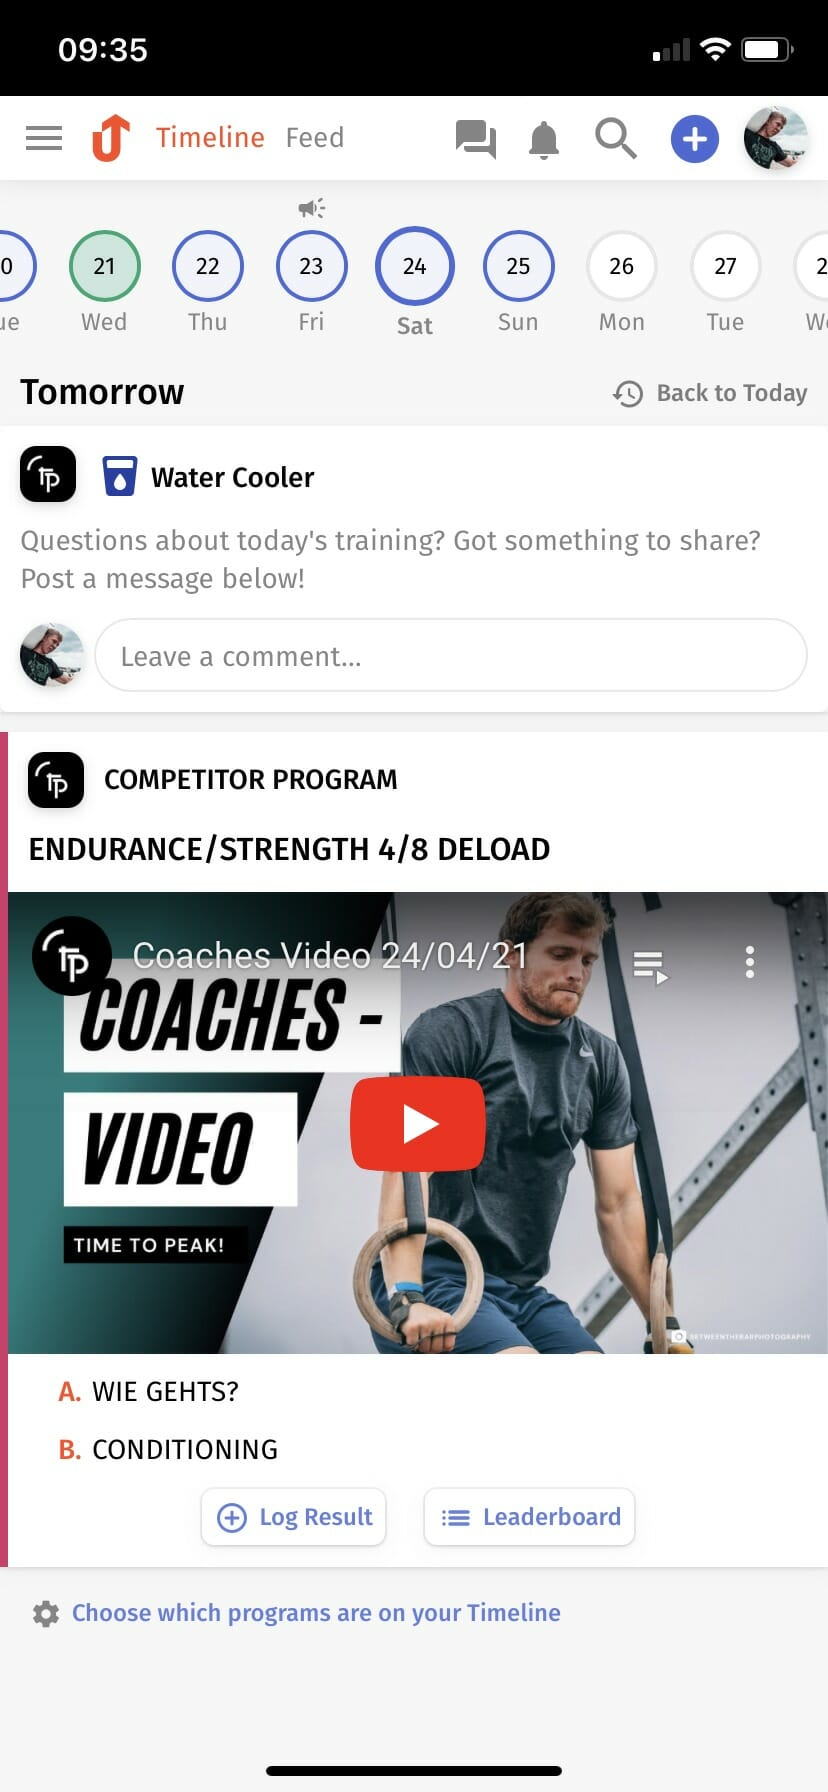 Time To Peak - Endurance & Strength